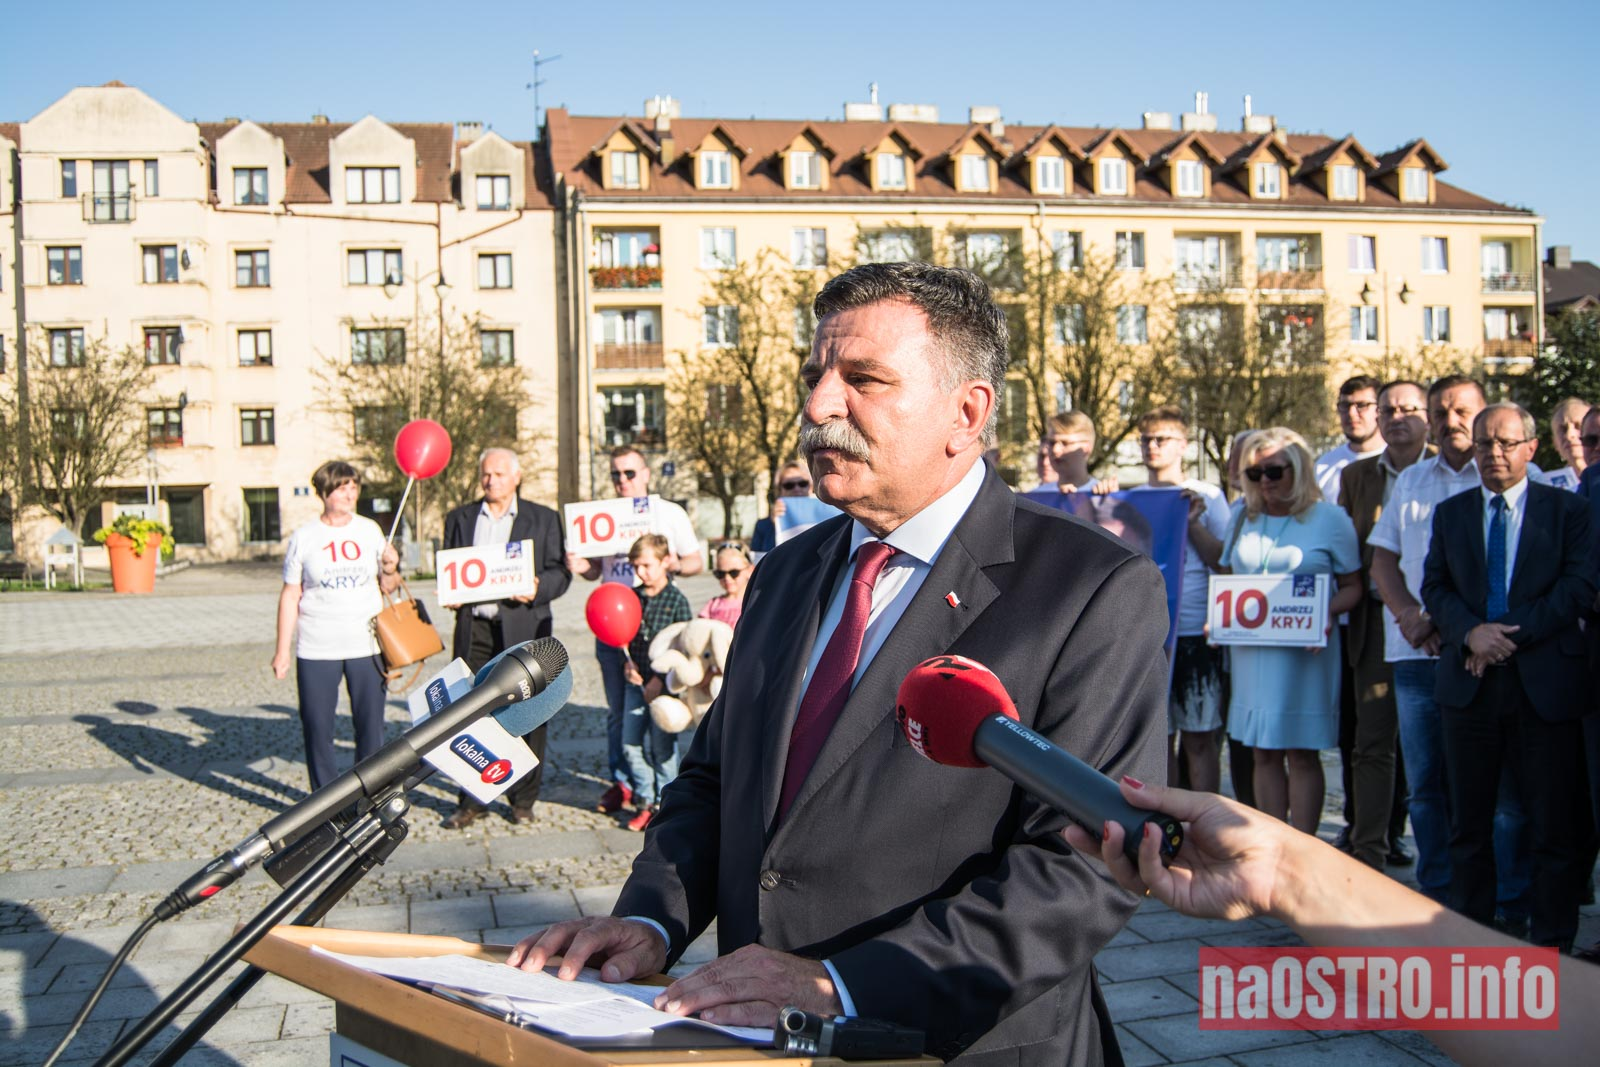 NaOSTRO Andrzej Kryj kampania-10